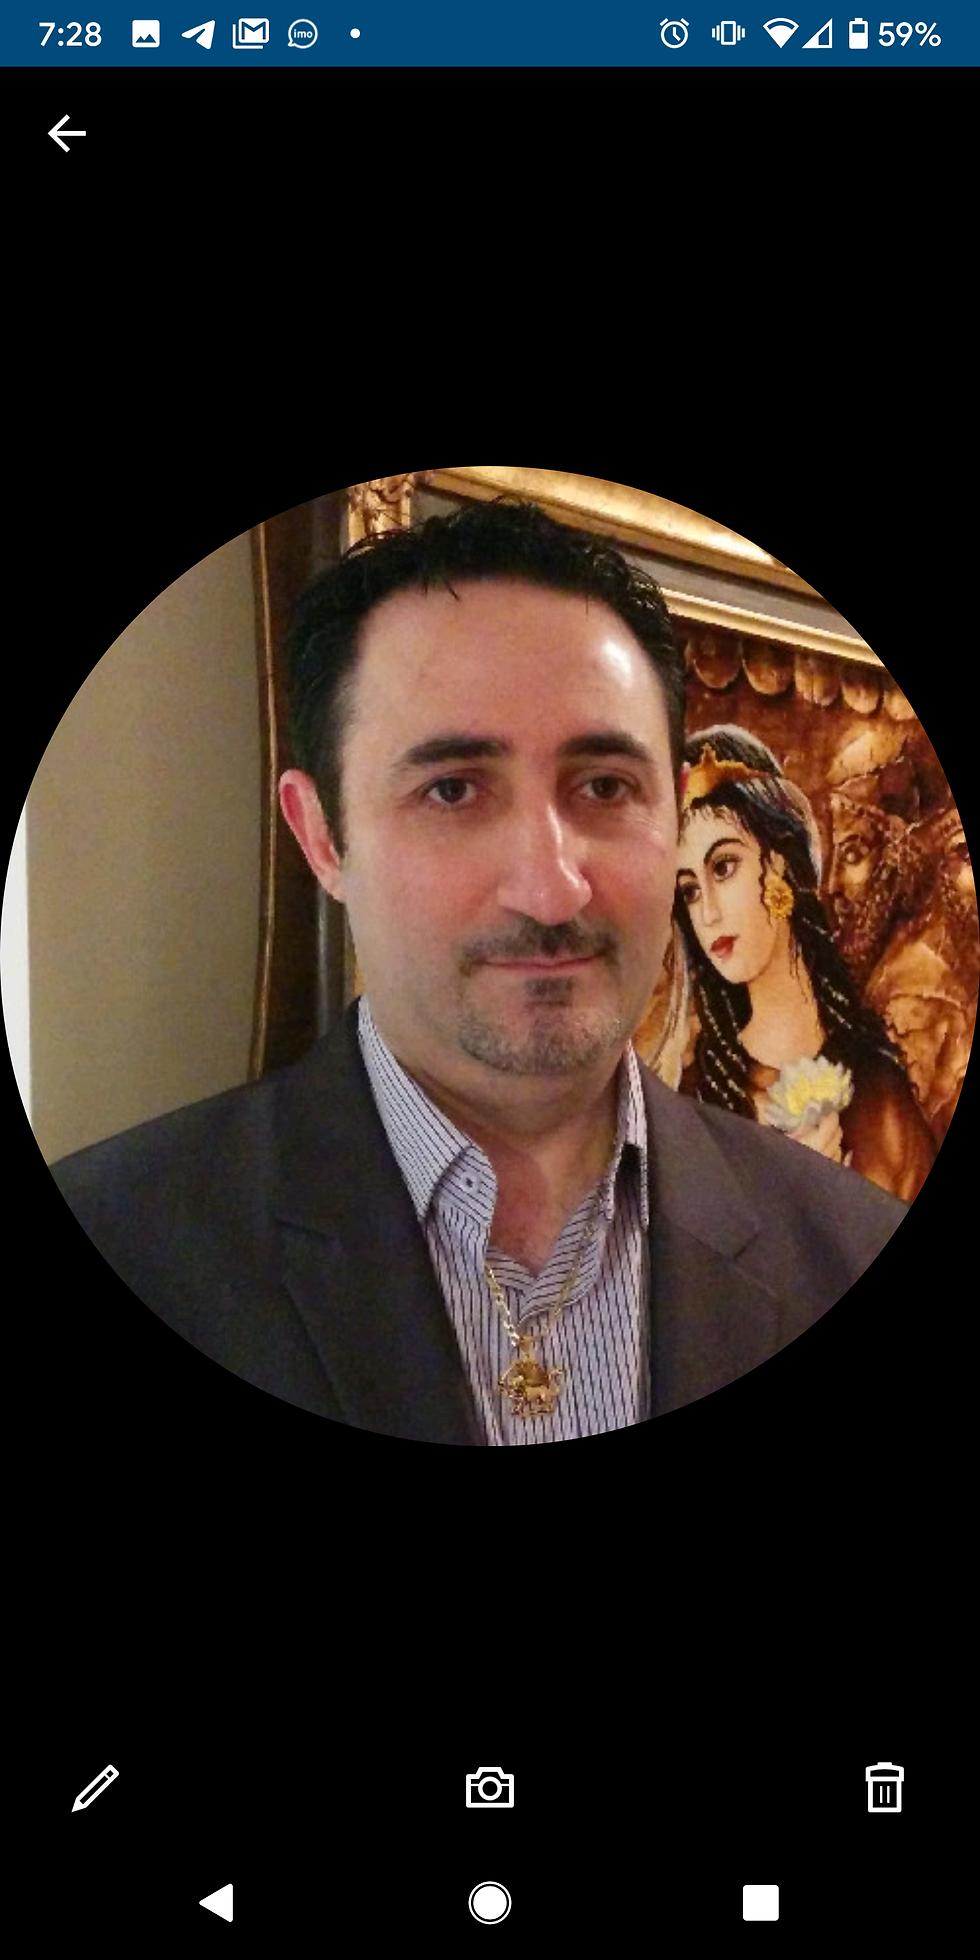 Farhad Ghasemikian